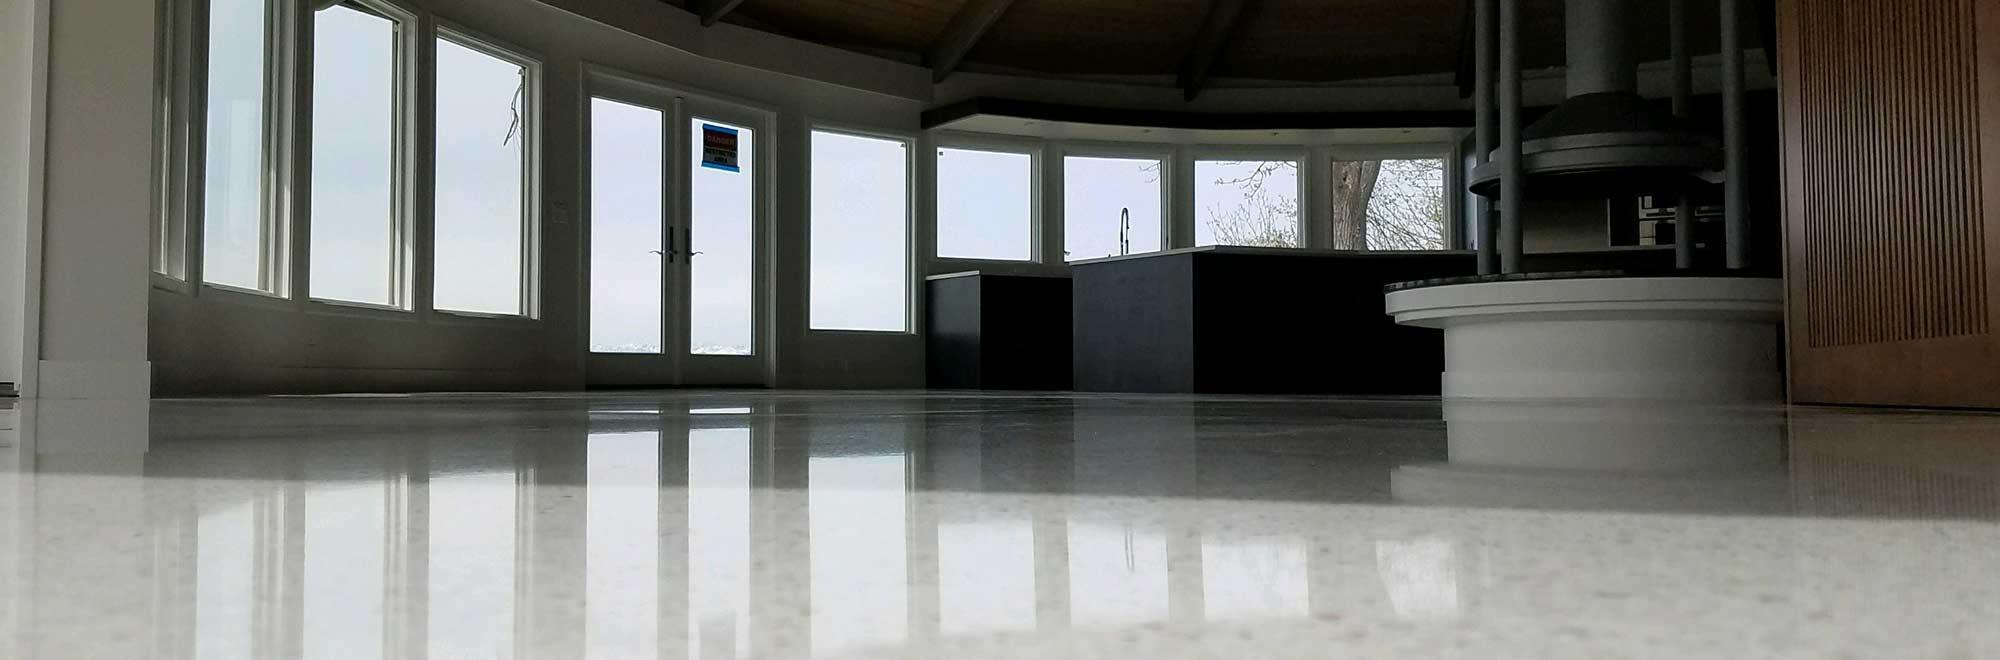 Spectrum Terrazzo flooring